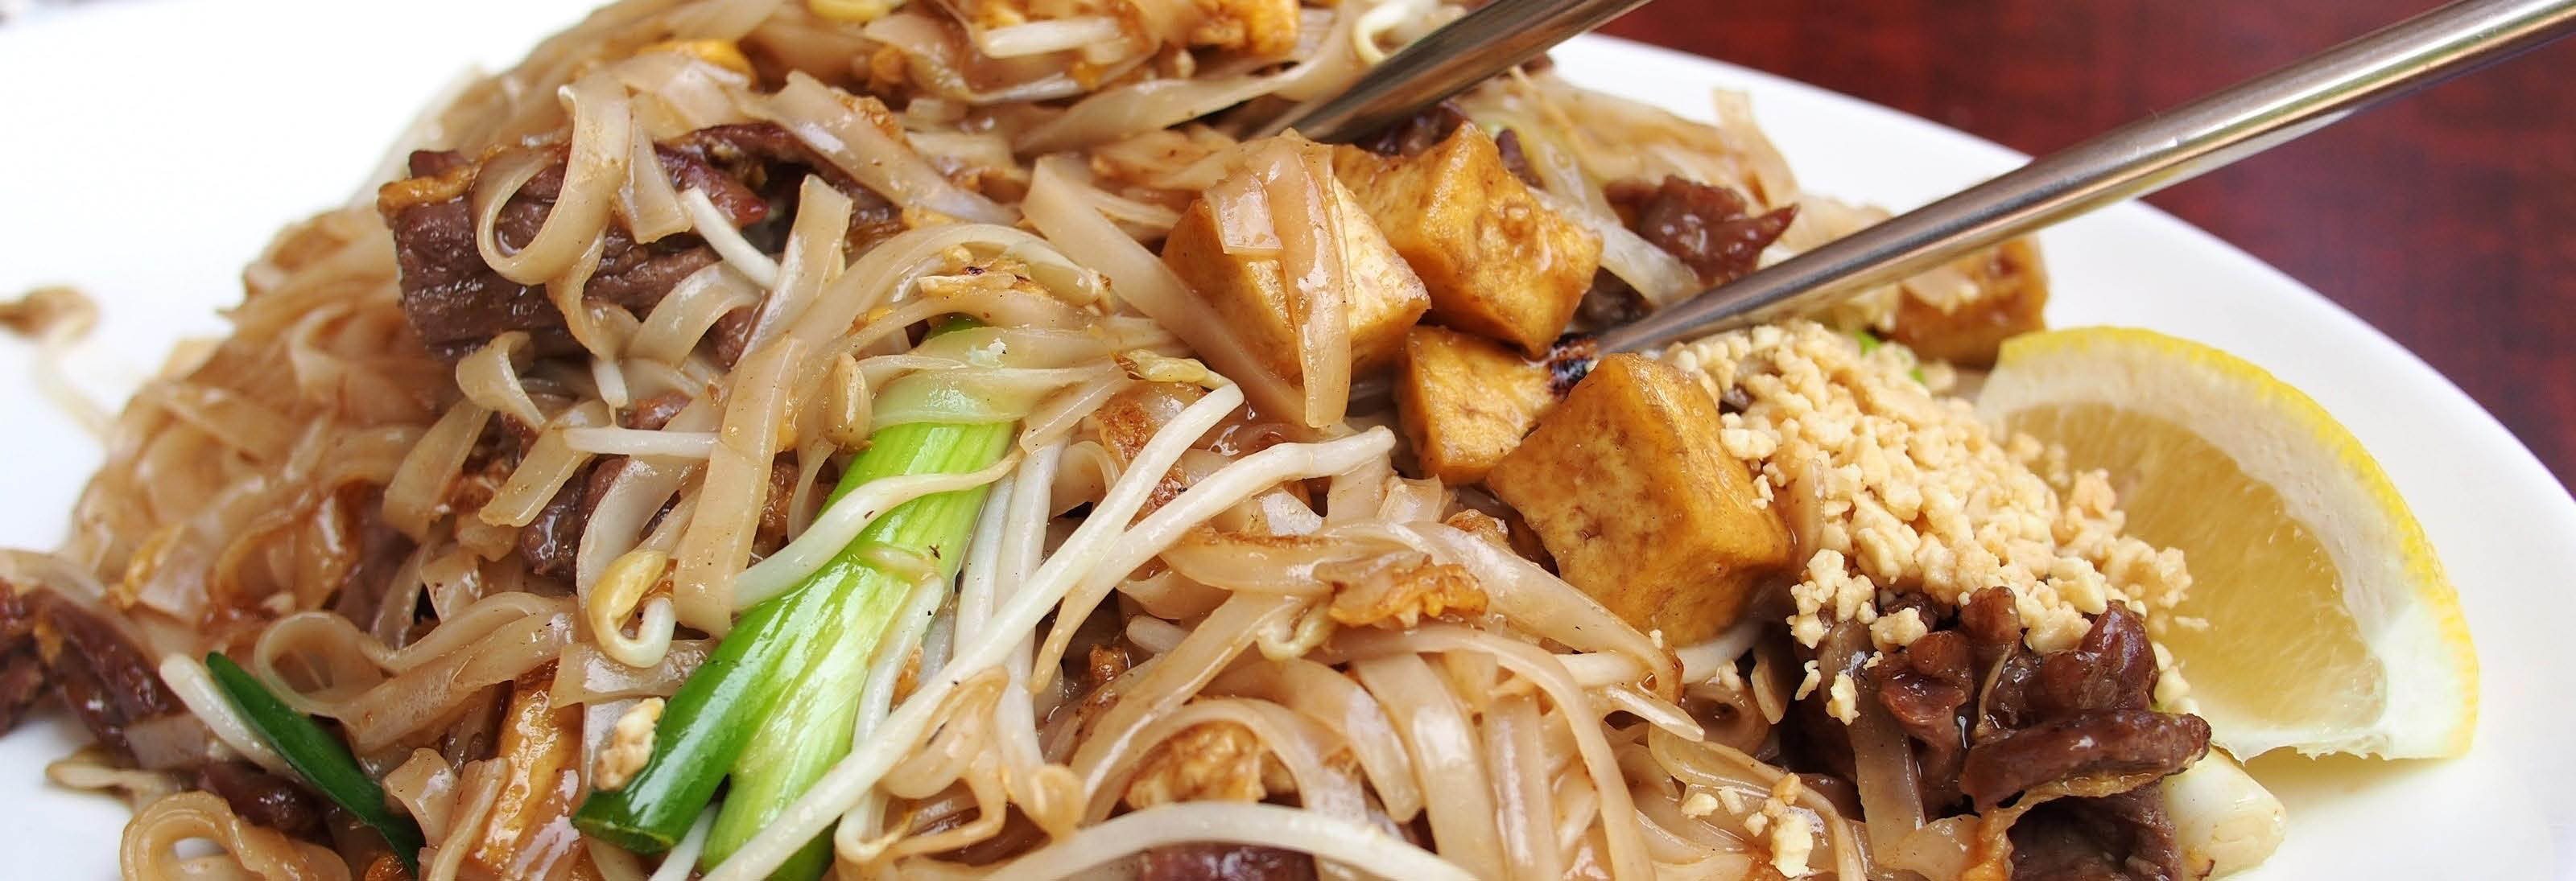 Thai House Authentic Thai Food Restaurant in Houston, TX banner